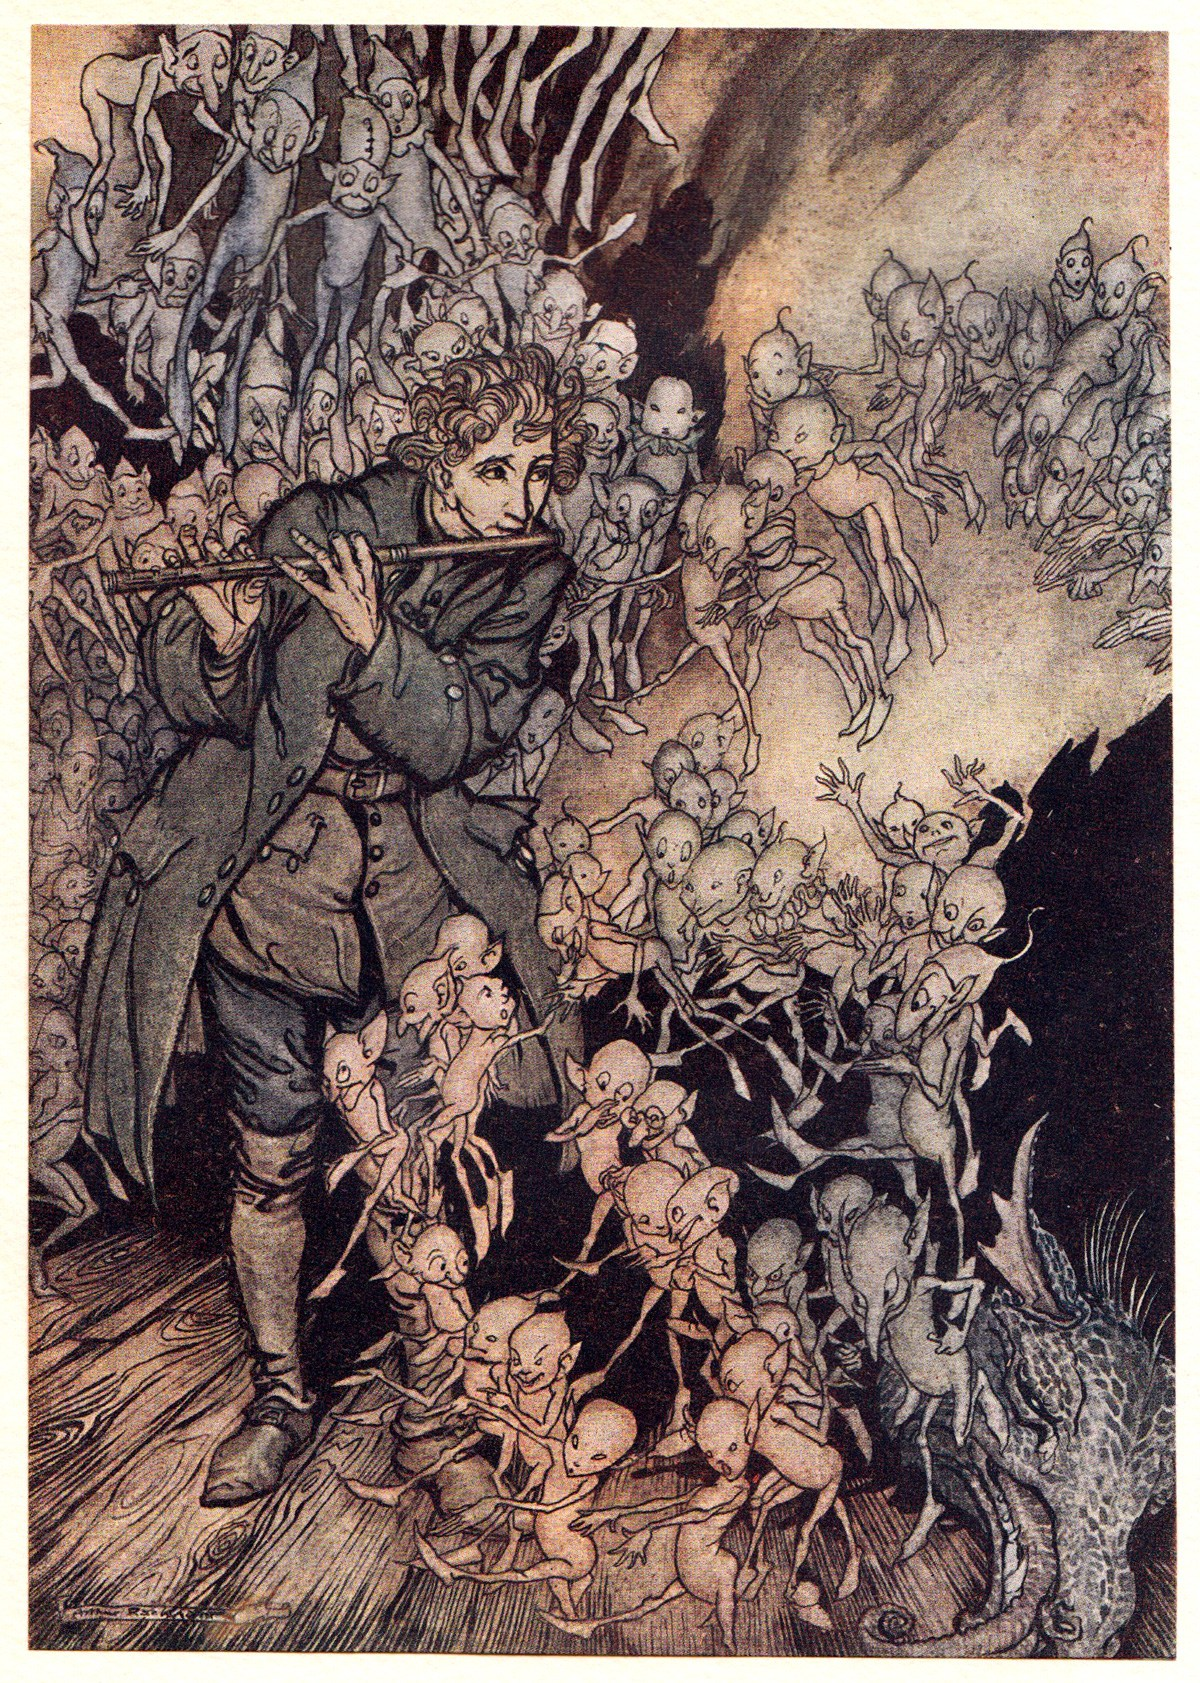 Gnome Arthur Rackham